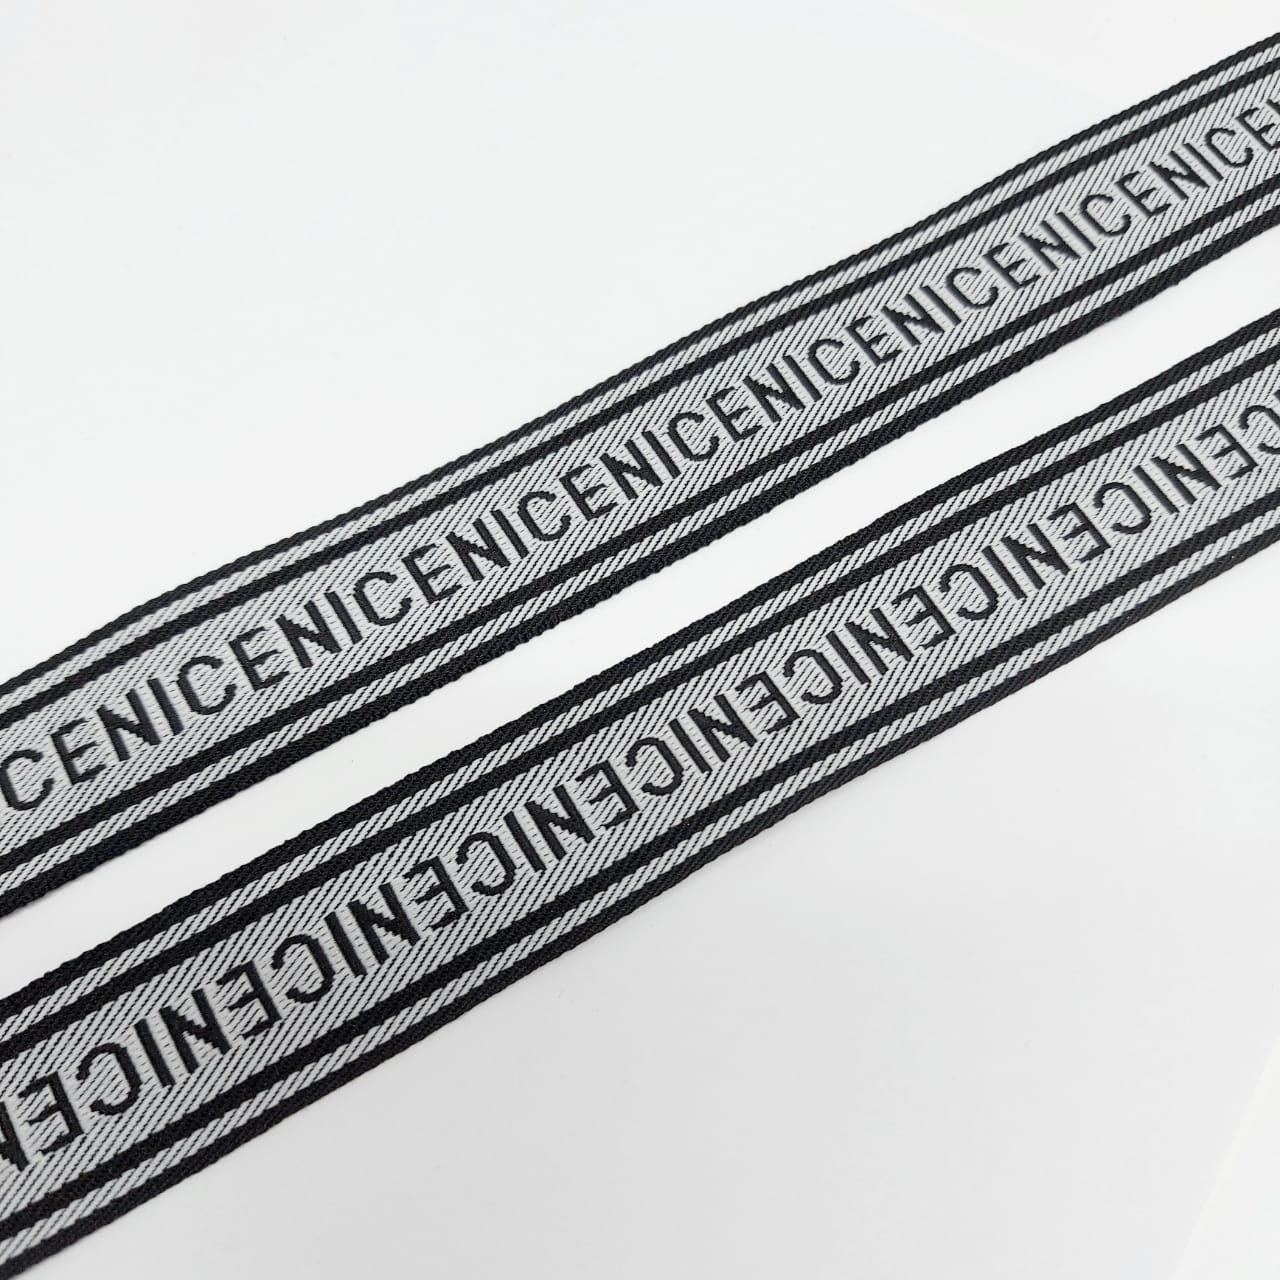 Тесьма серый черный NICE 2,5см 1 метр